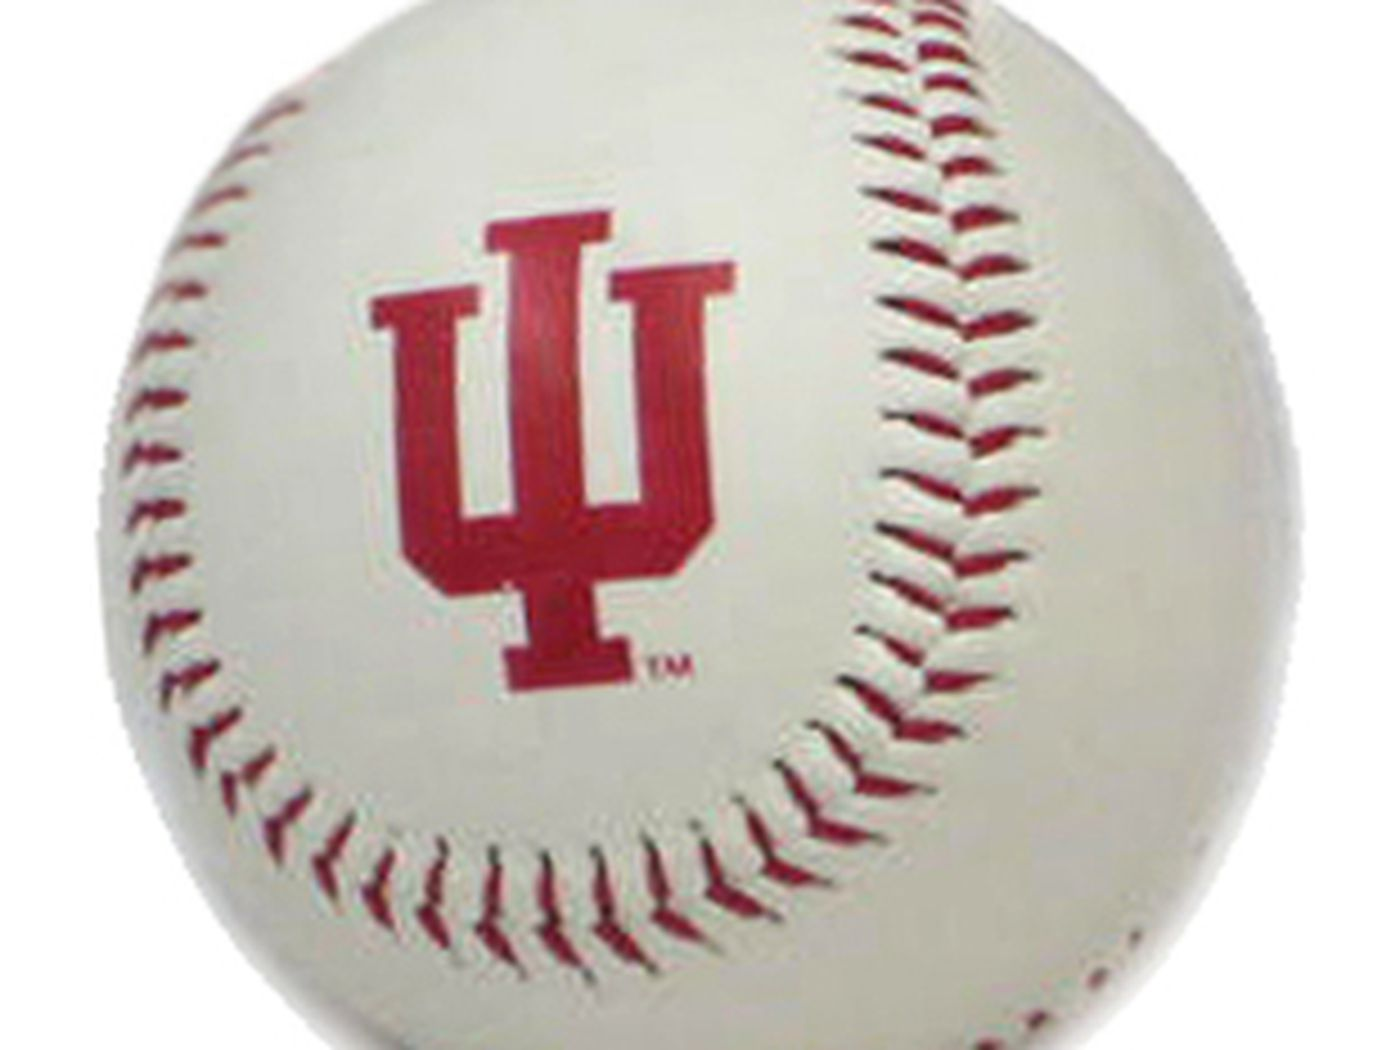 iu baseball sitting pretty in big ten tournament - the crimson quarry